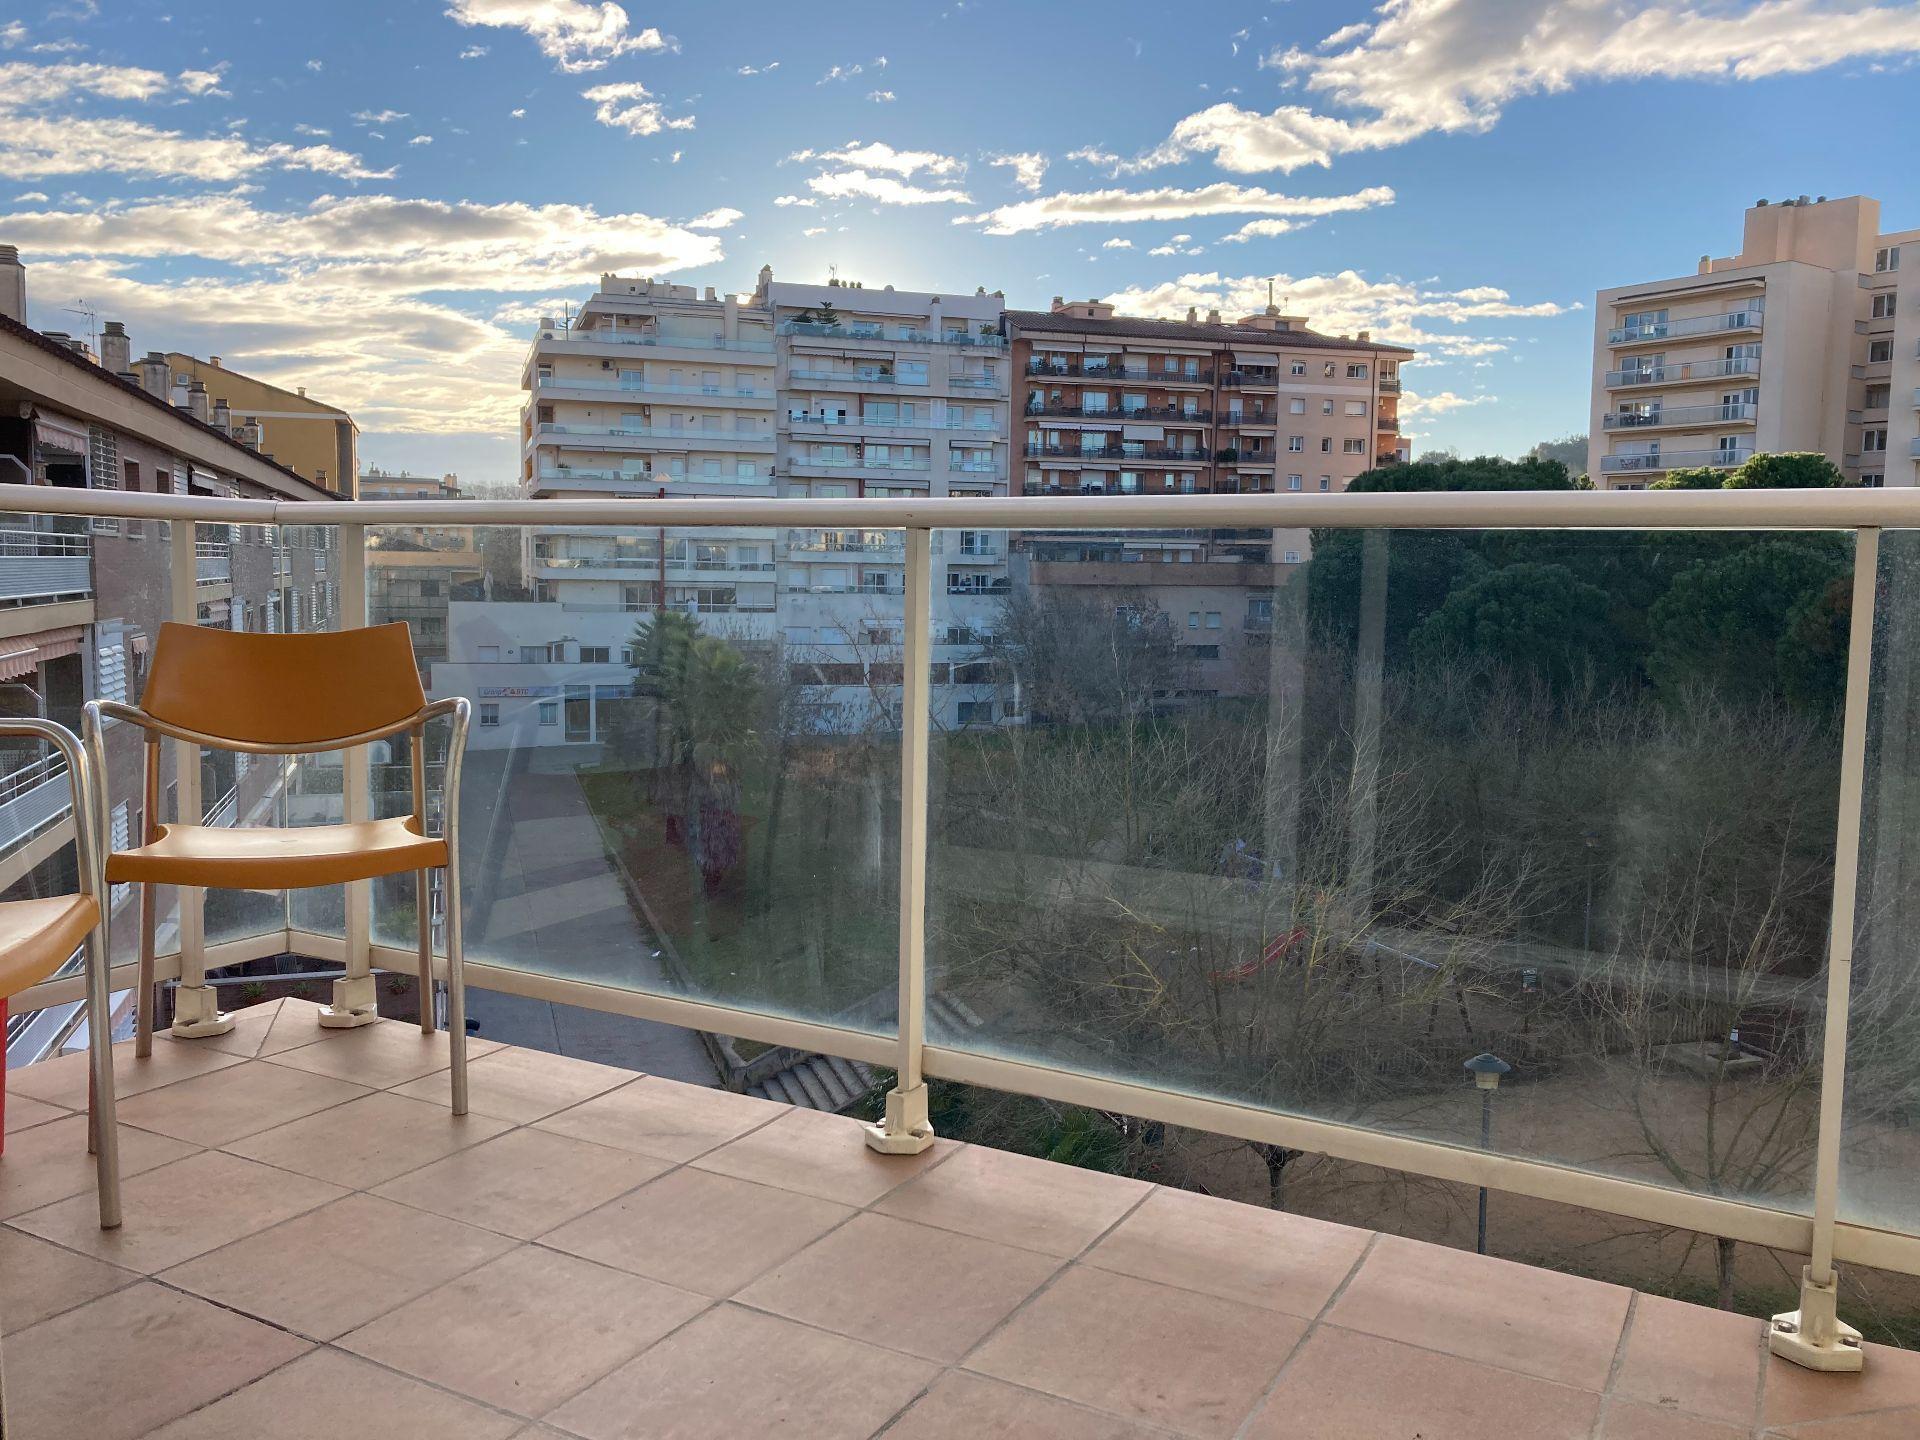 Dúplex a Girona, en lloguer